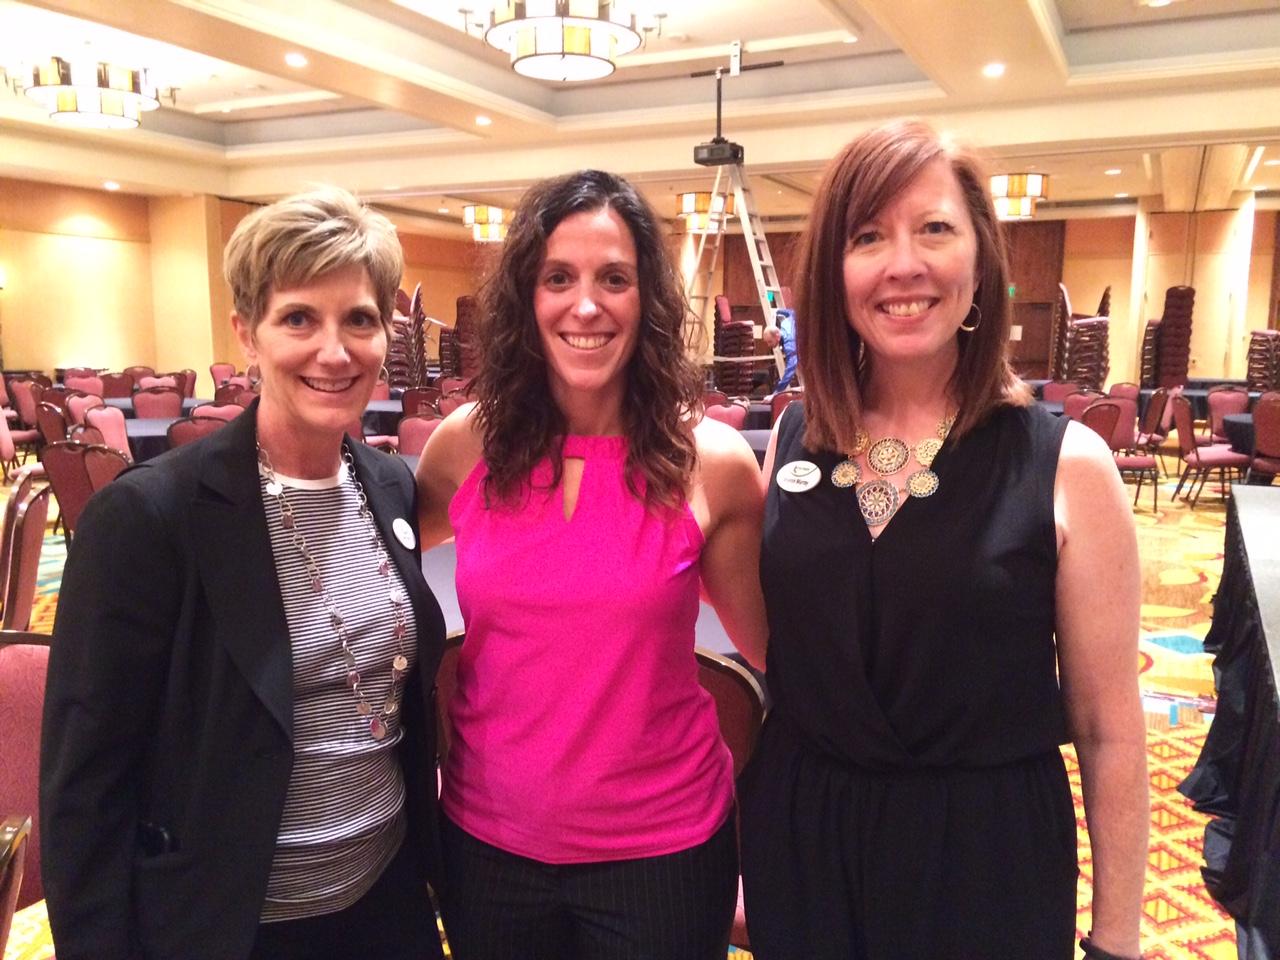 Joan Brucha, VP at RMC Health, myself and Sharon Murray, President & CEO of RMC Health